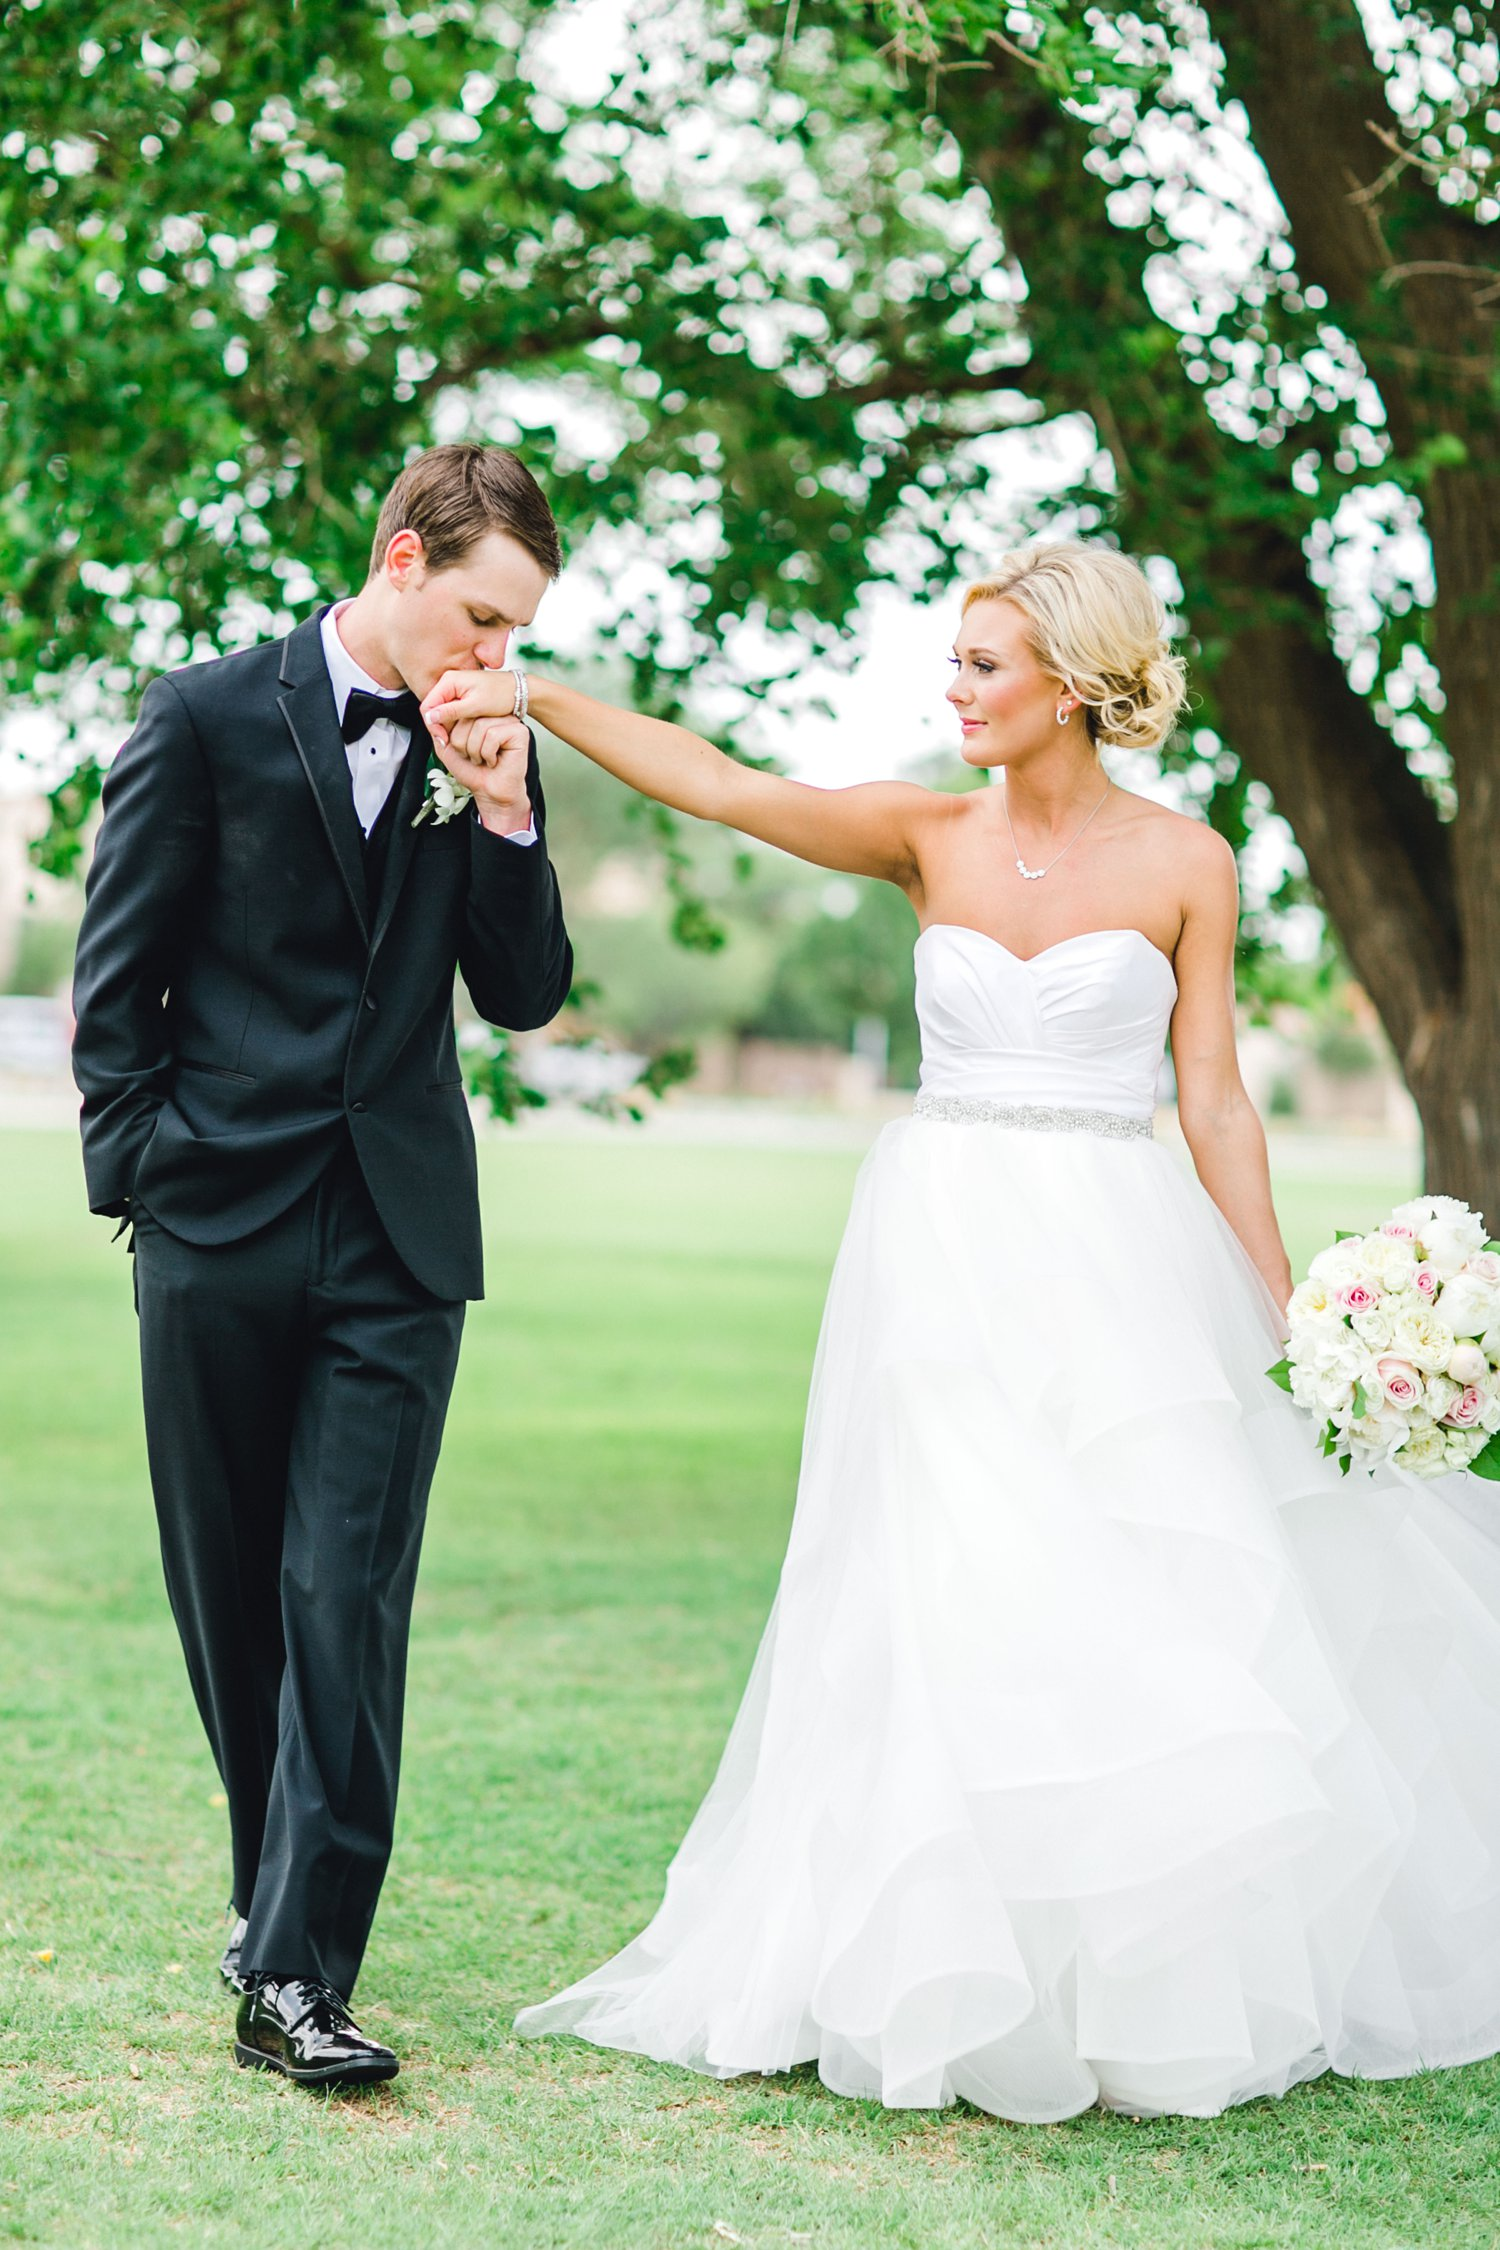 Taylor-and-Brock-Williams-Texas-Tech-University-Merket-Alumni-Center-Lubbock-Photographer-ALLEEJ0069.jpg